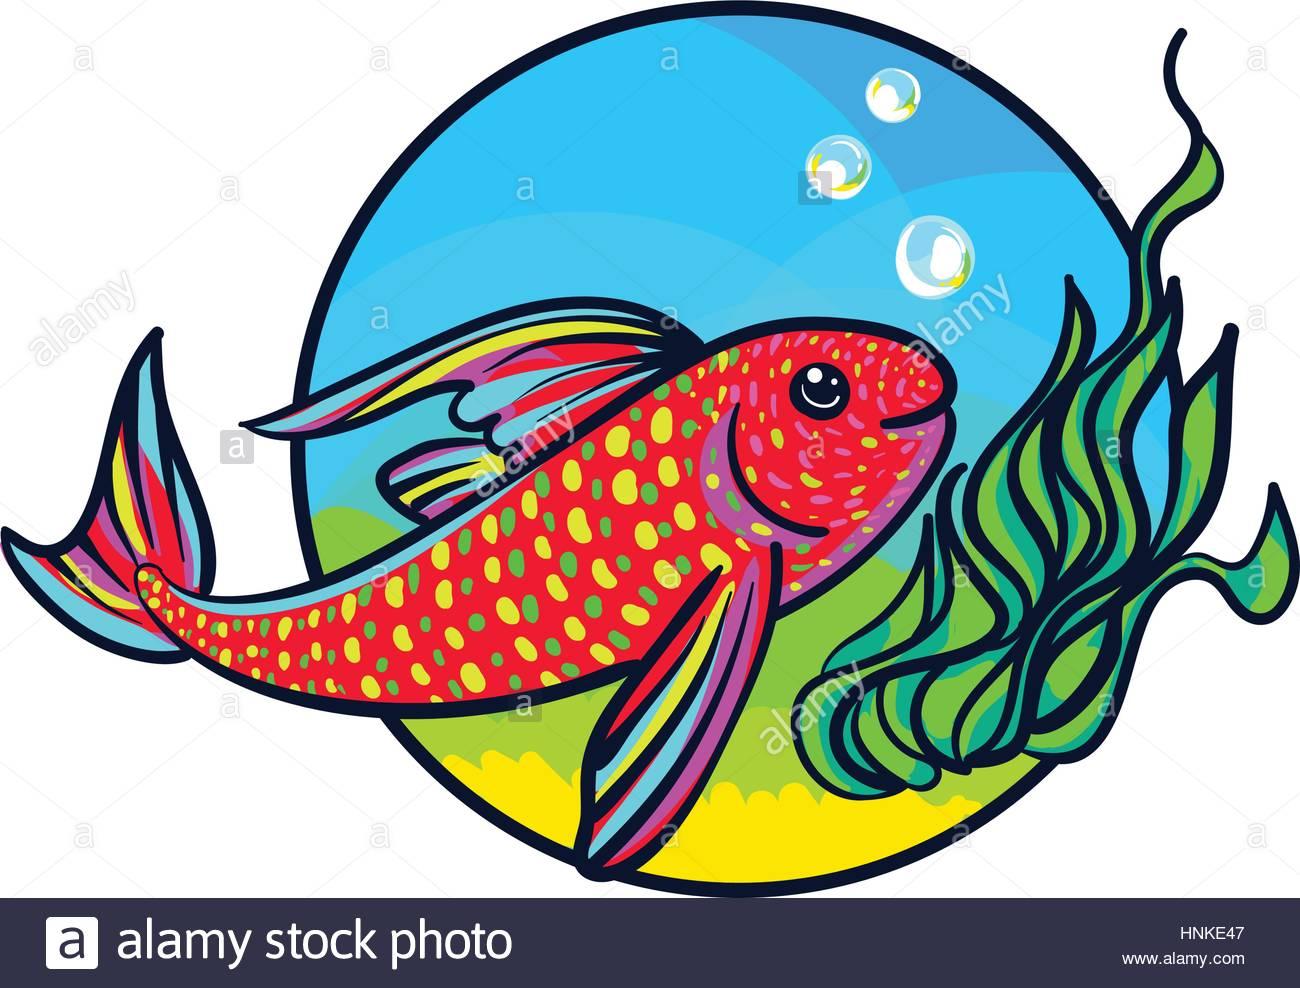 1300x988 Bright Aquarium Fish. Tropical Animal Art, Cute Cartoon Style